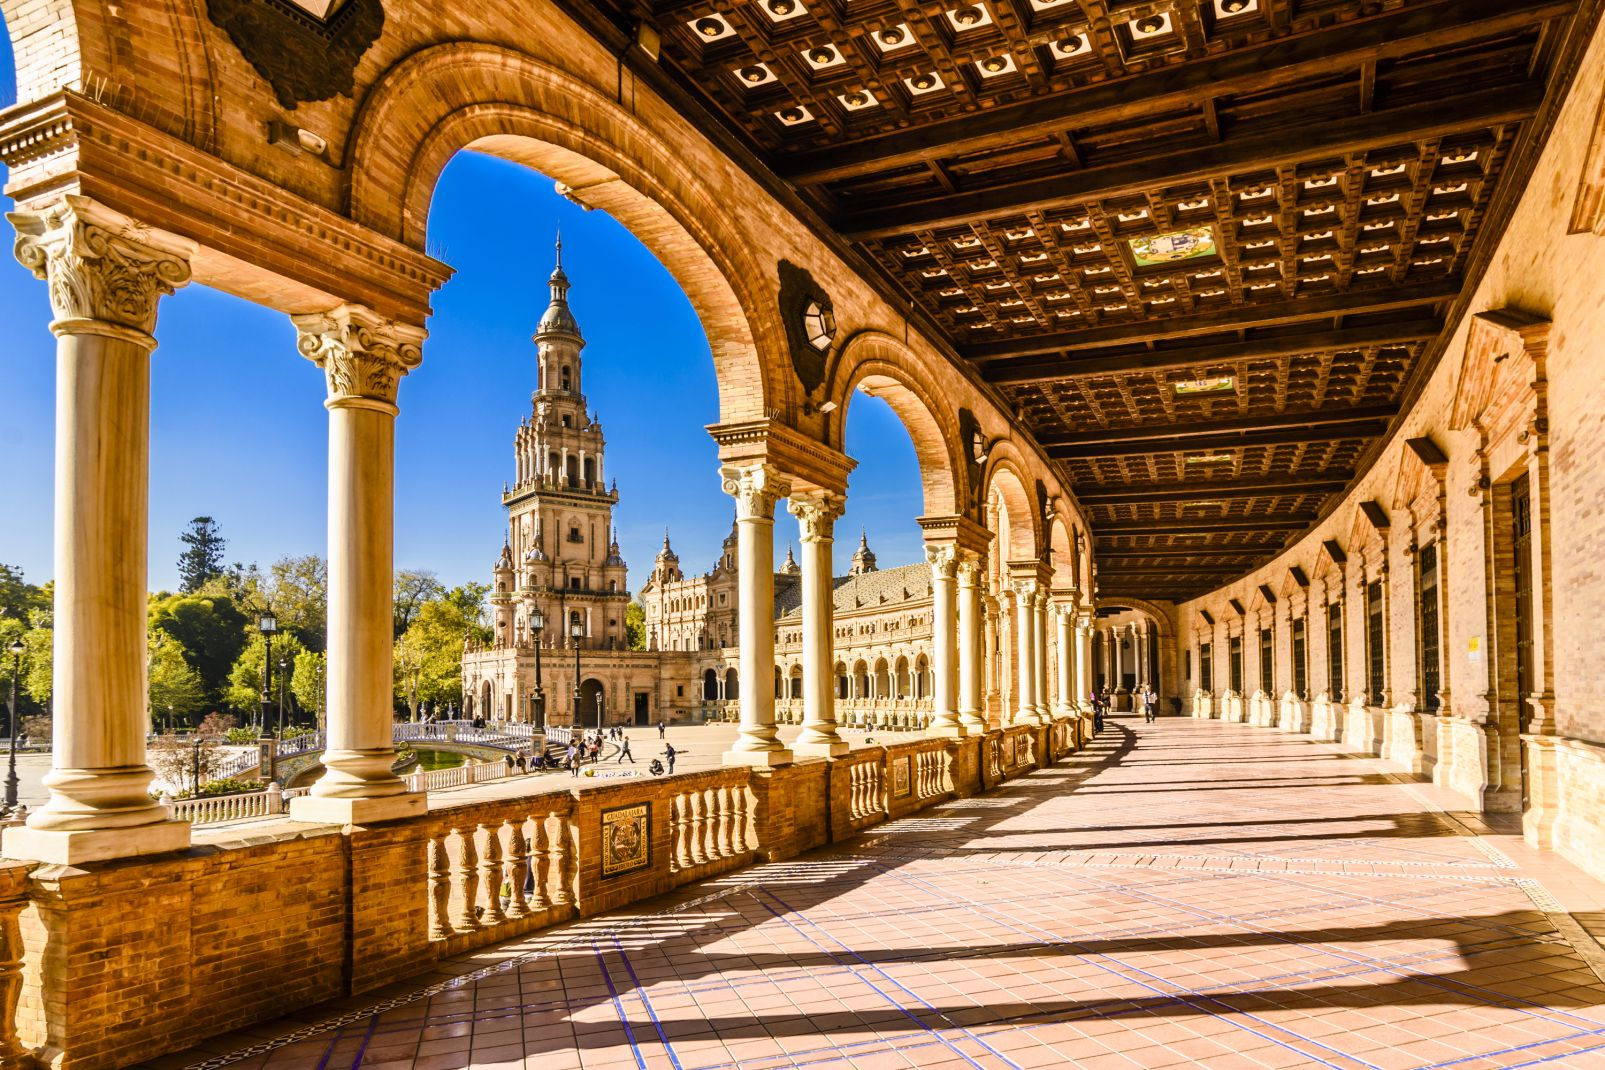 Europe, Espagne, Andalousie, alhambra, grenade